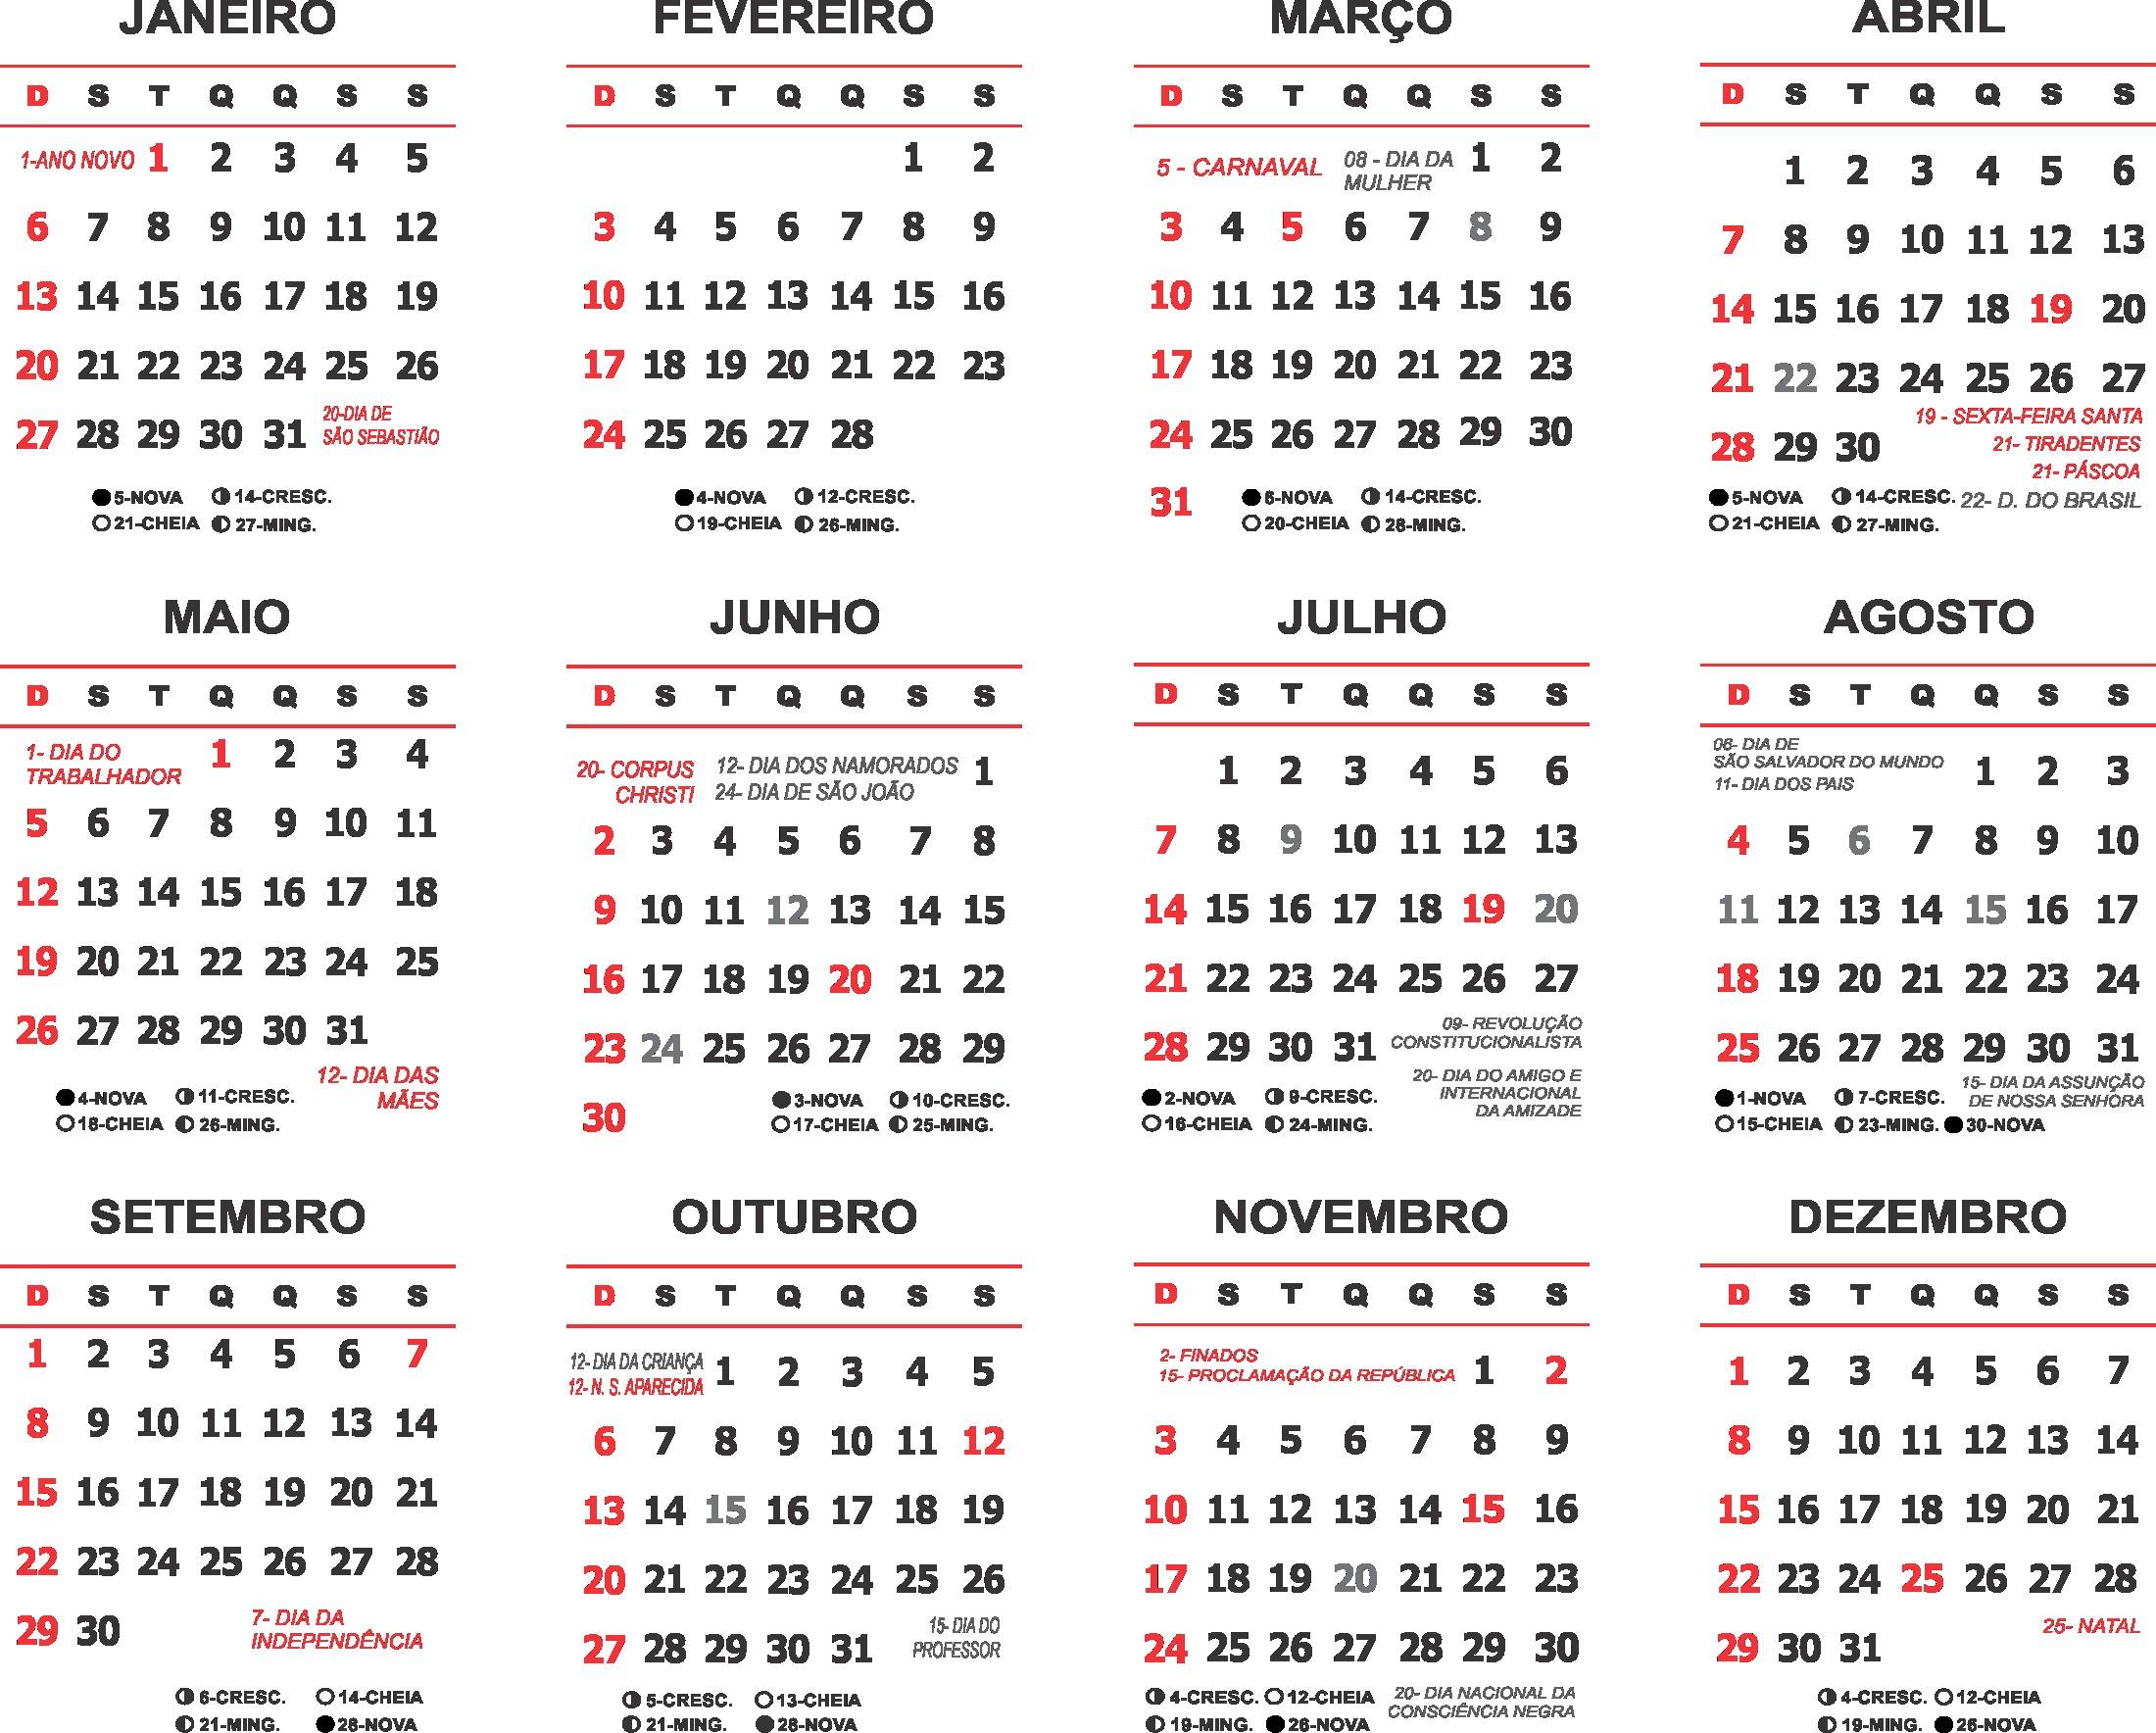 calendario carreras chile 2019 calendario carreras chile 2019 base calendario 2019 simples feriados imagem legal